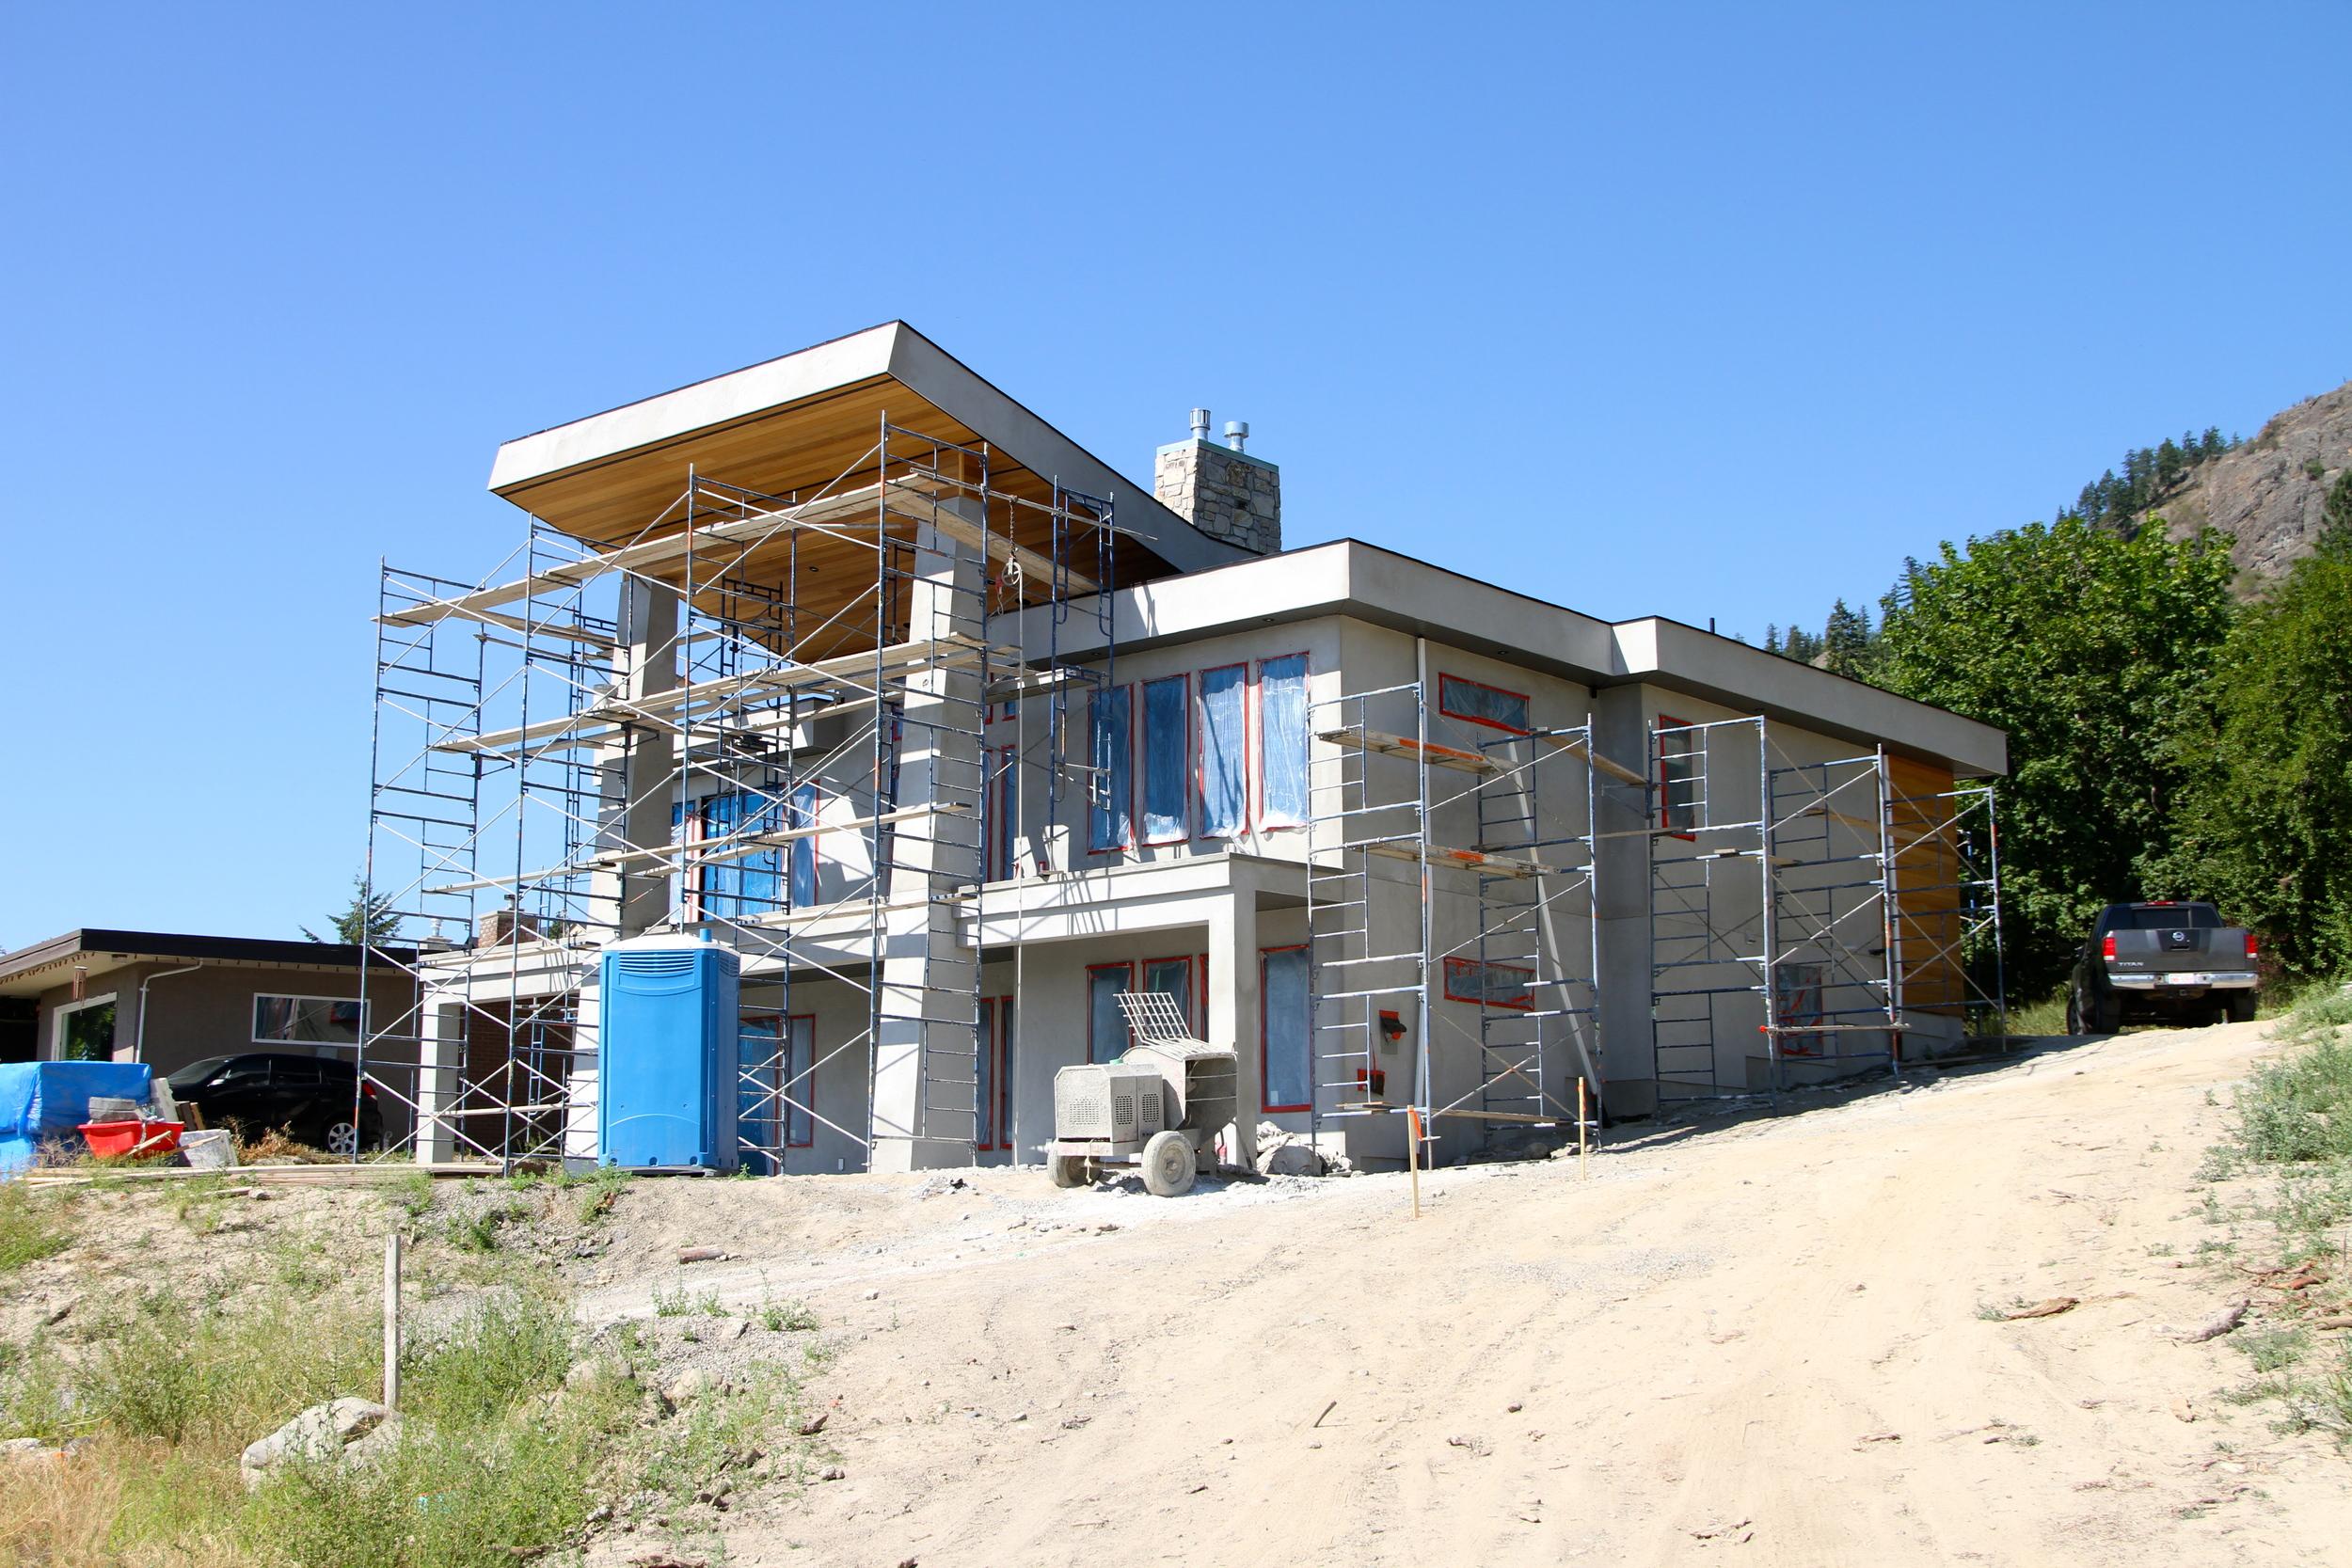 Home Build Construction